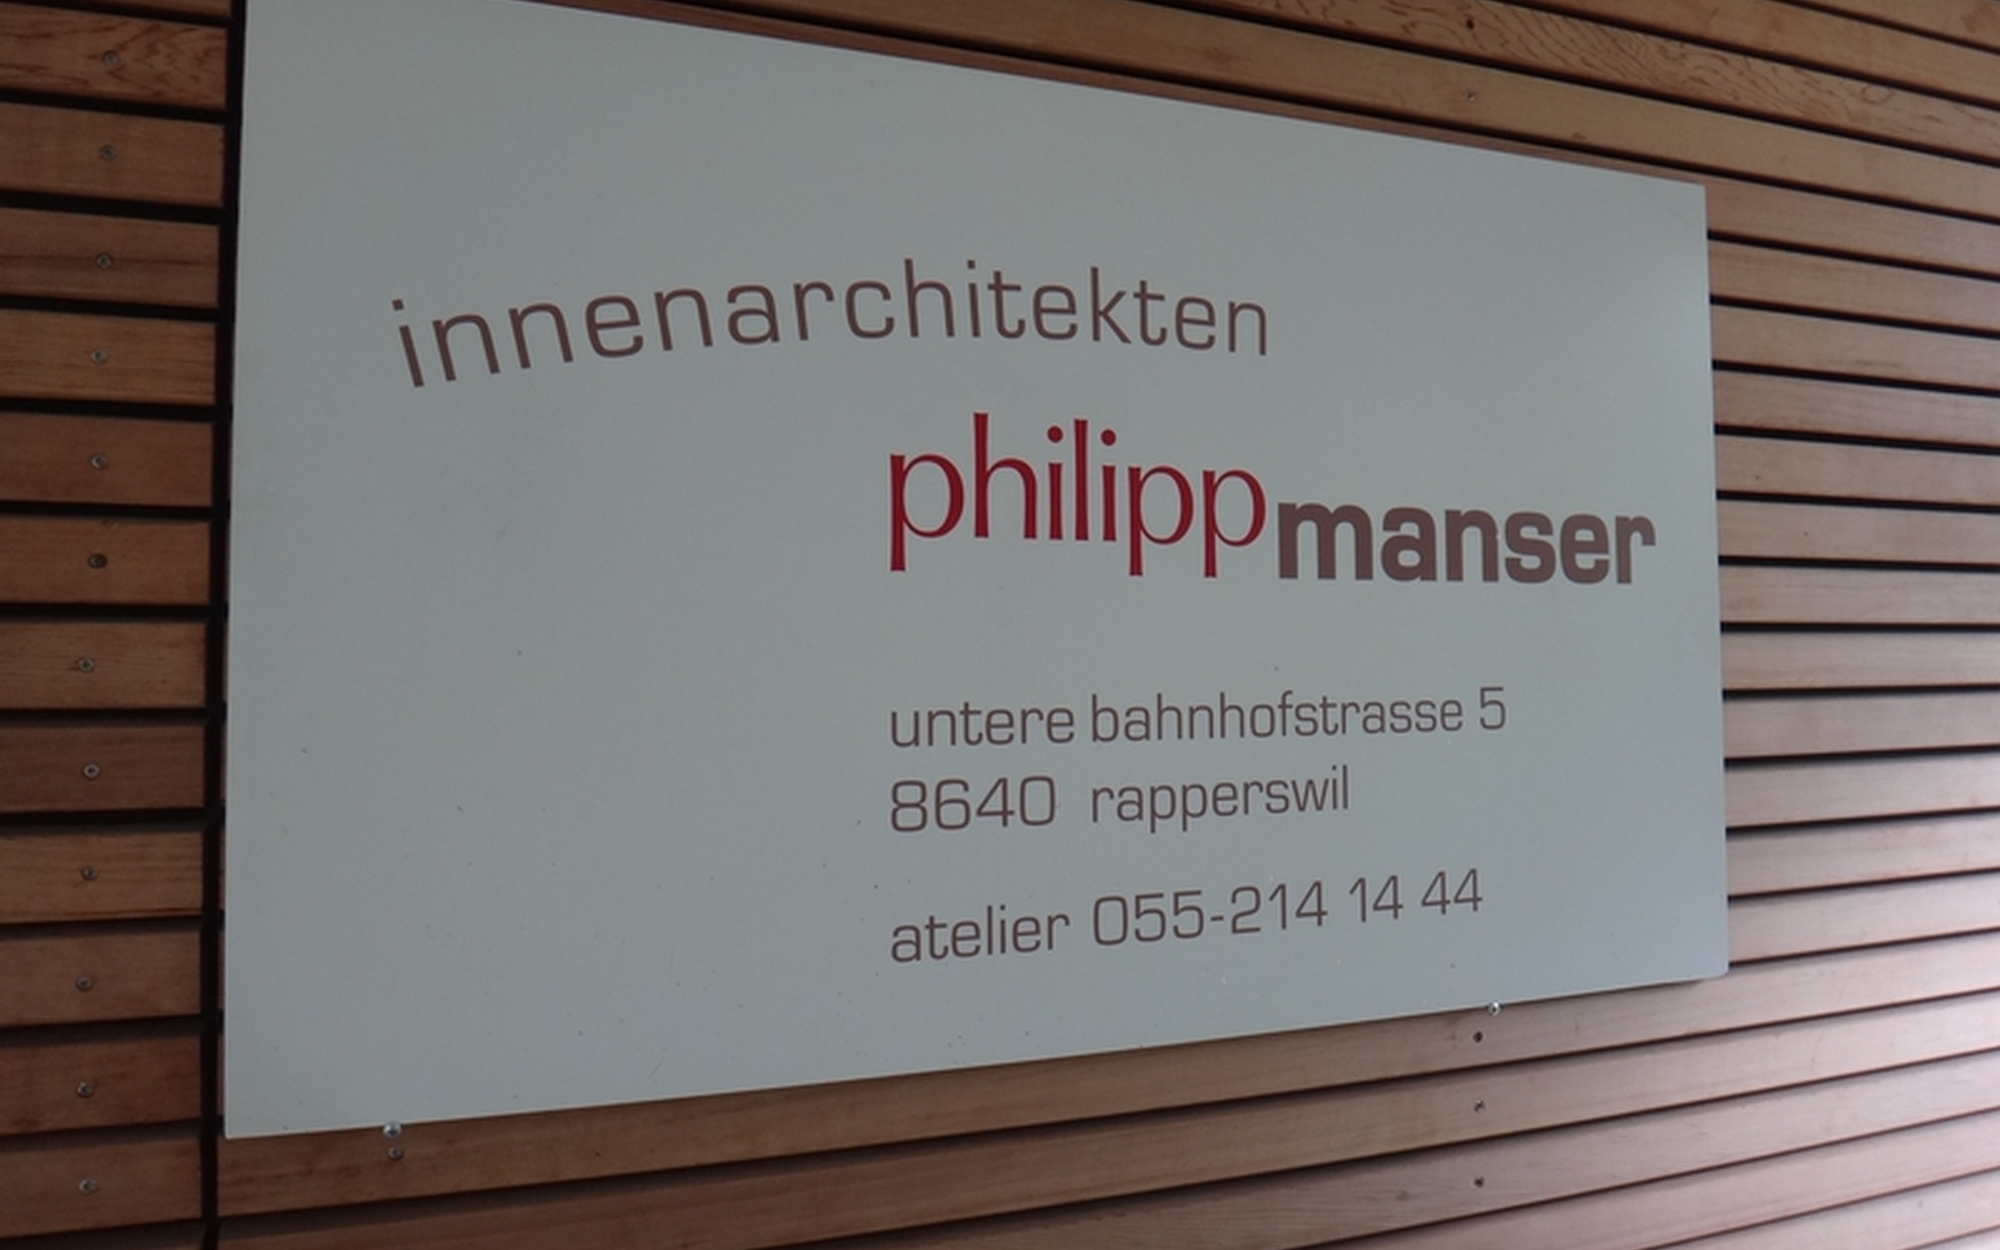 Innenarchitektur Rapperswil kontakt innenarchitekten philipp manser